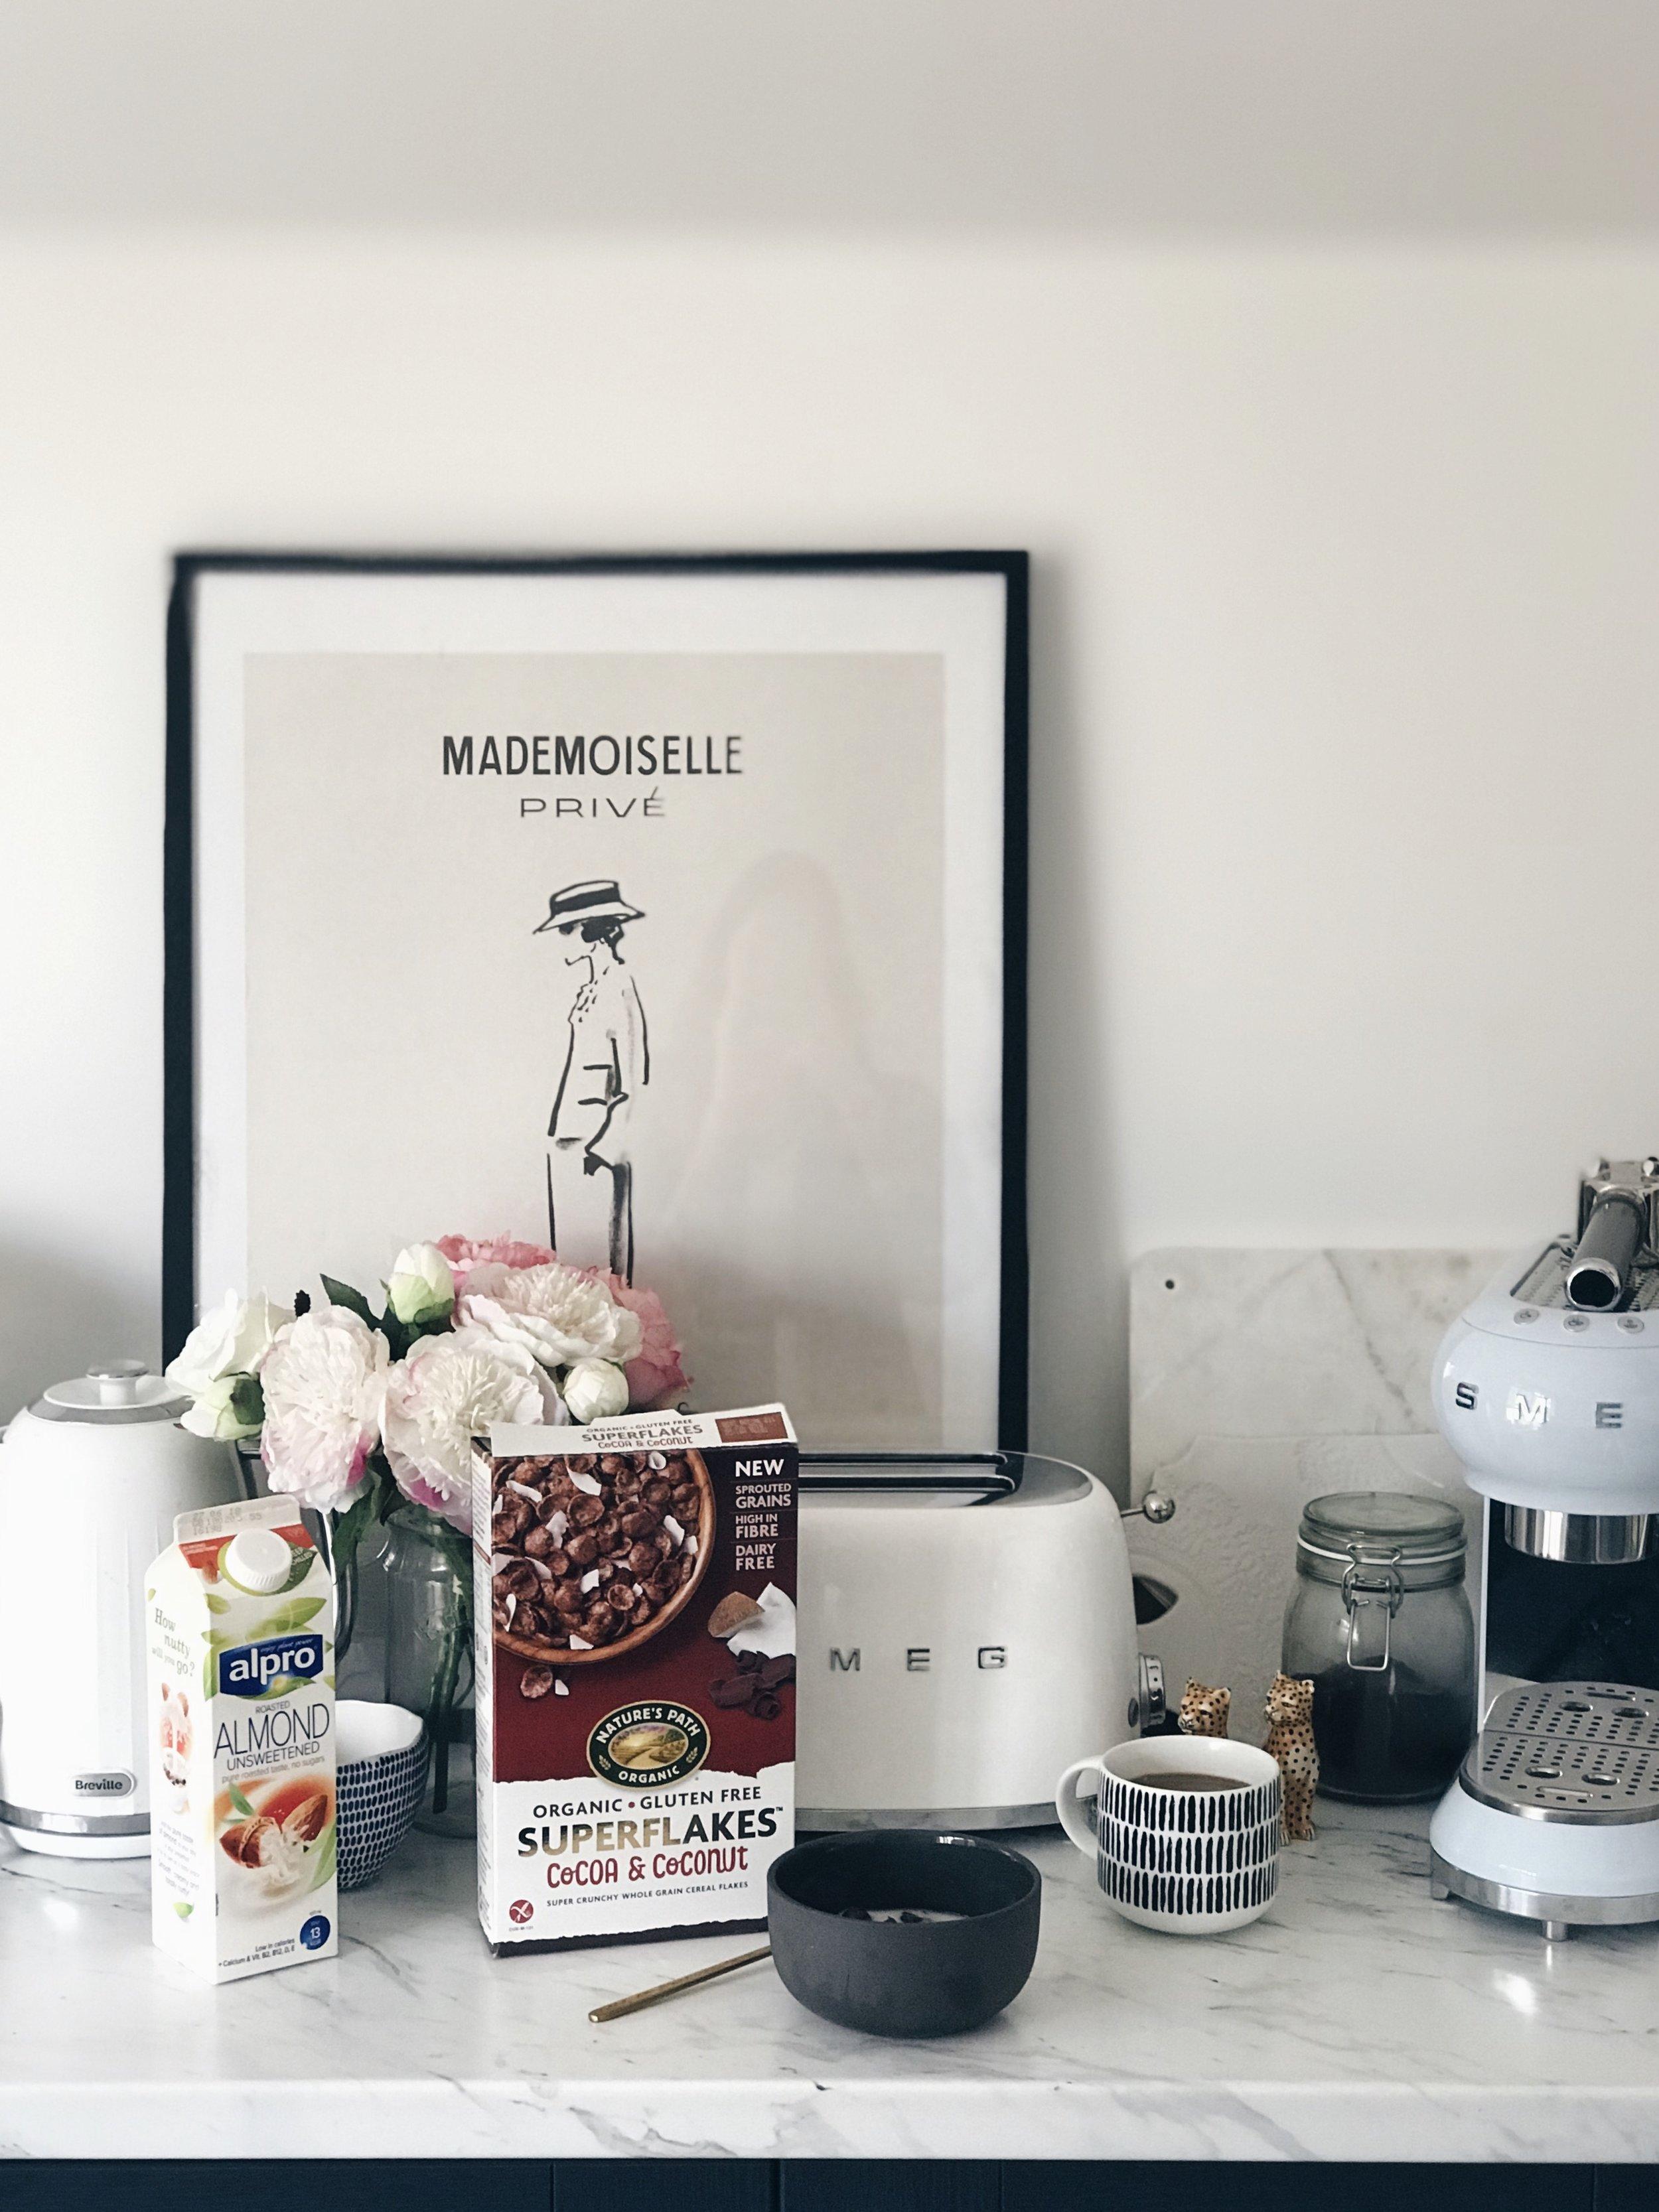 Smeg Espresso Machine, The Creative Larder Wickes Milton Kitchen